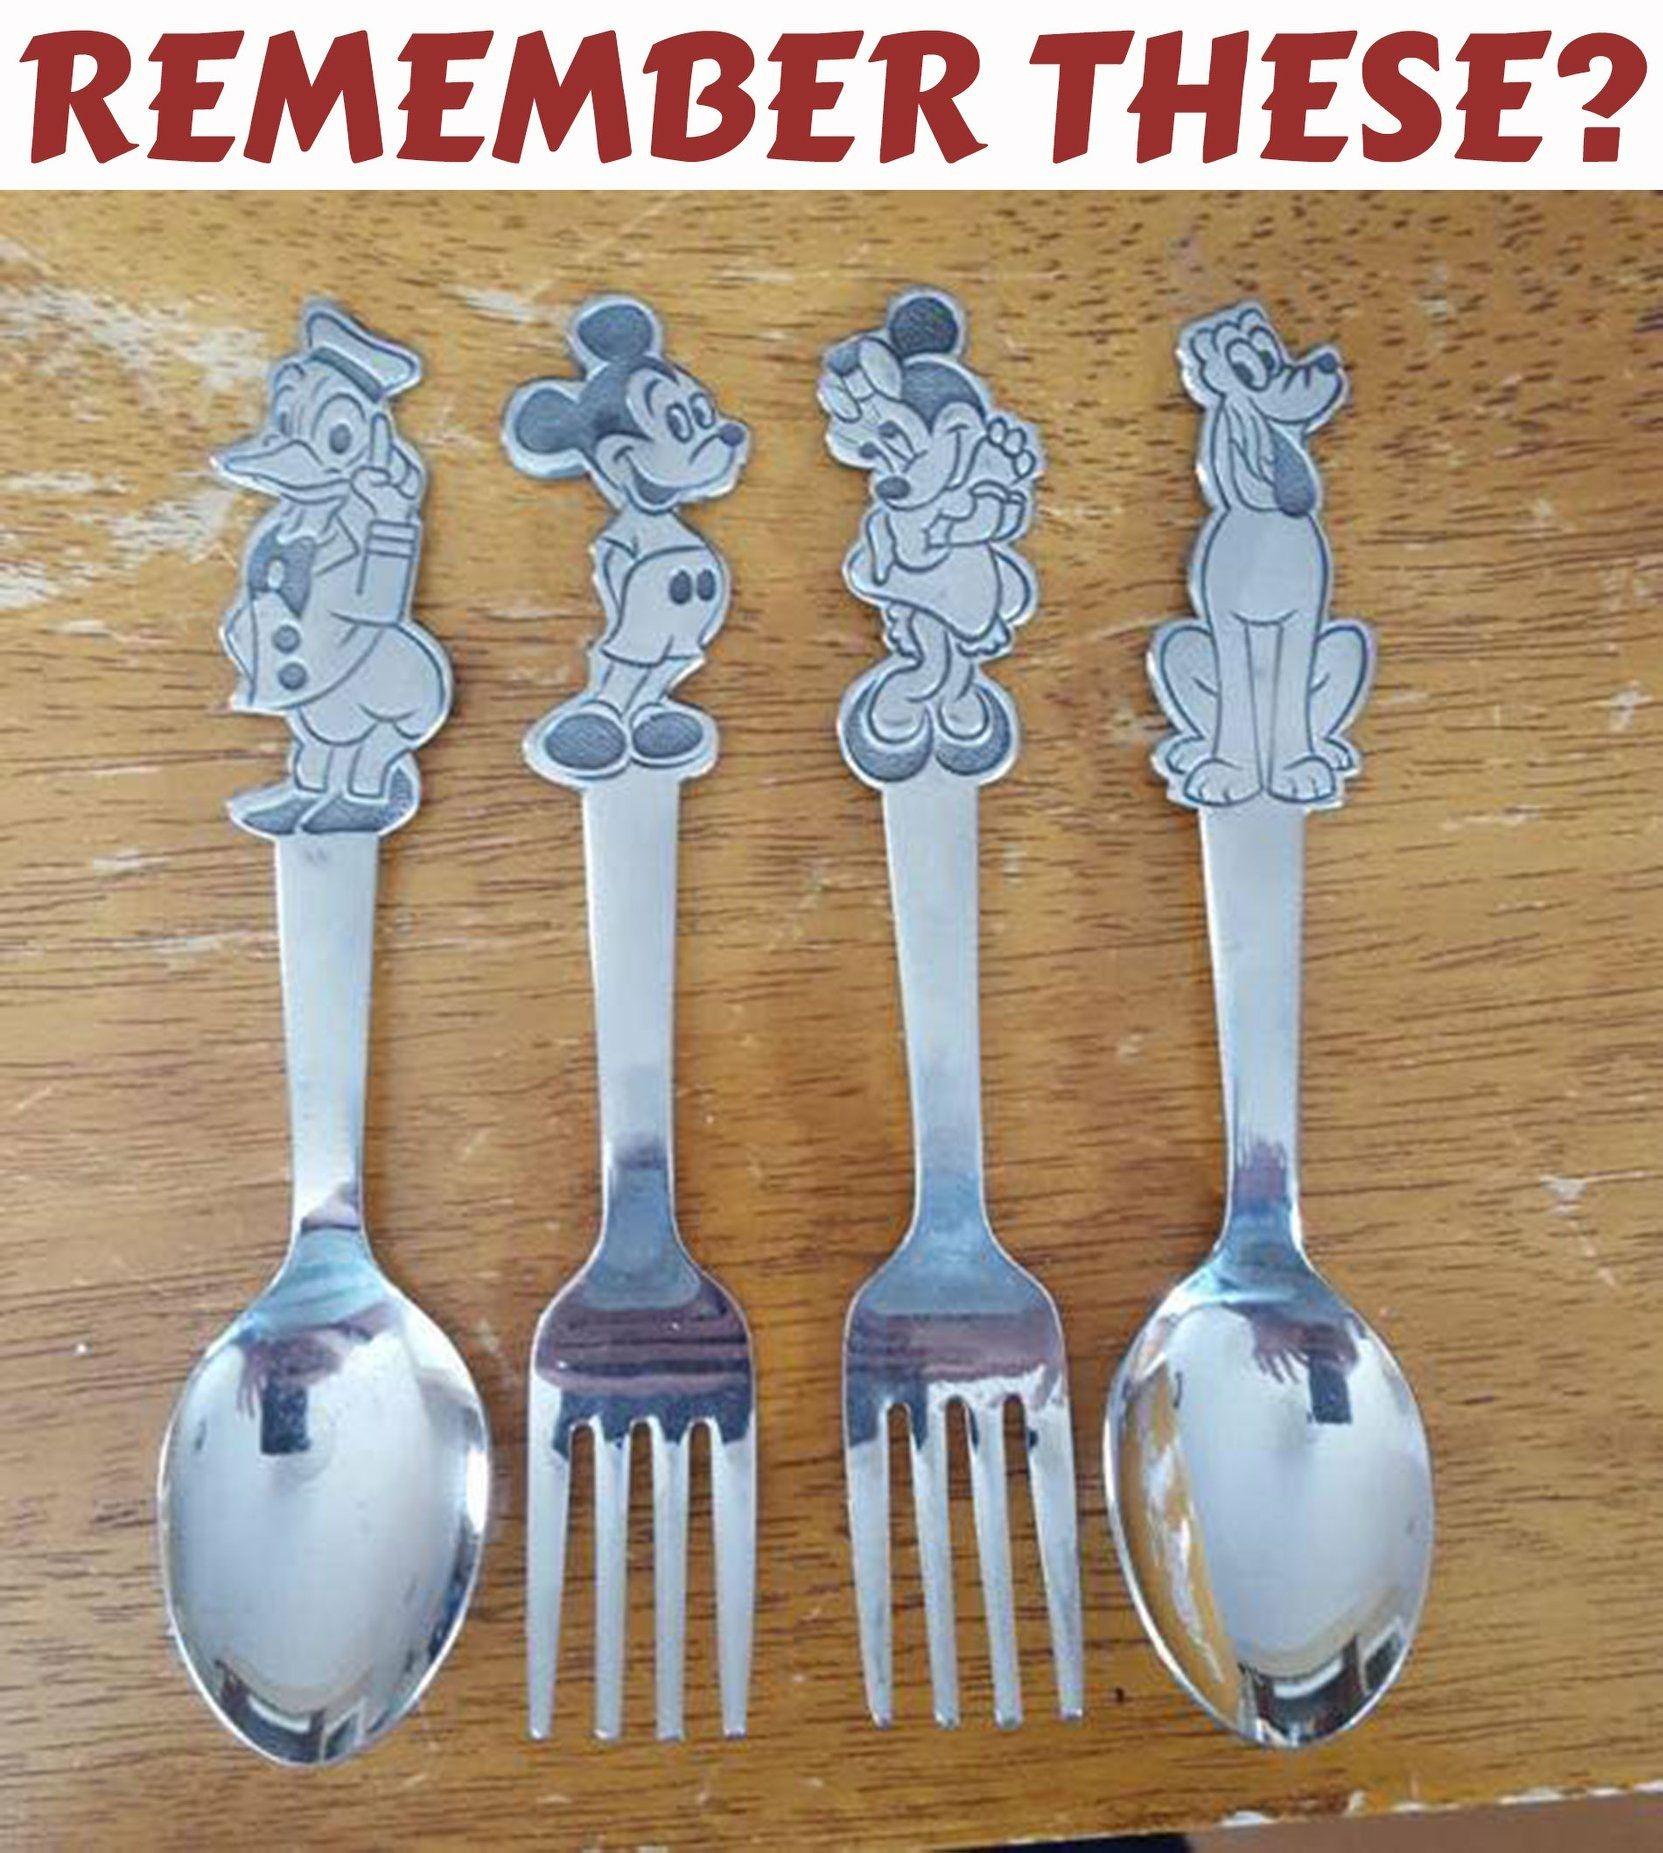 Pin by Denise PilatCuratolo on DisneyGone but not forgotten